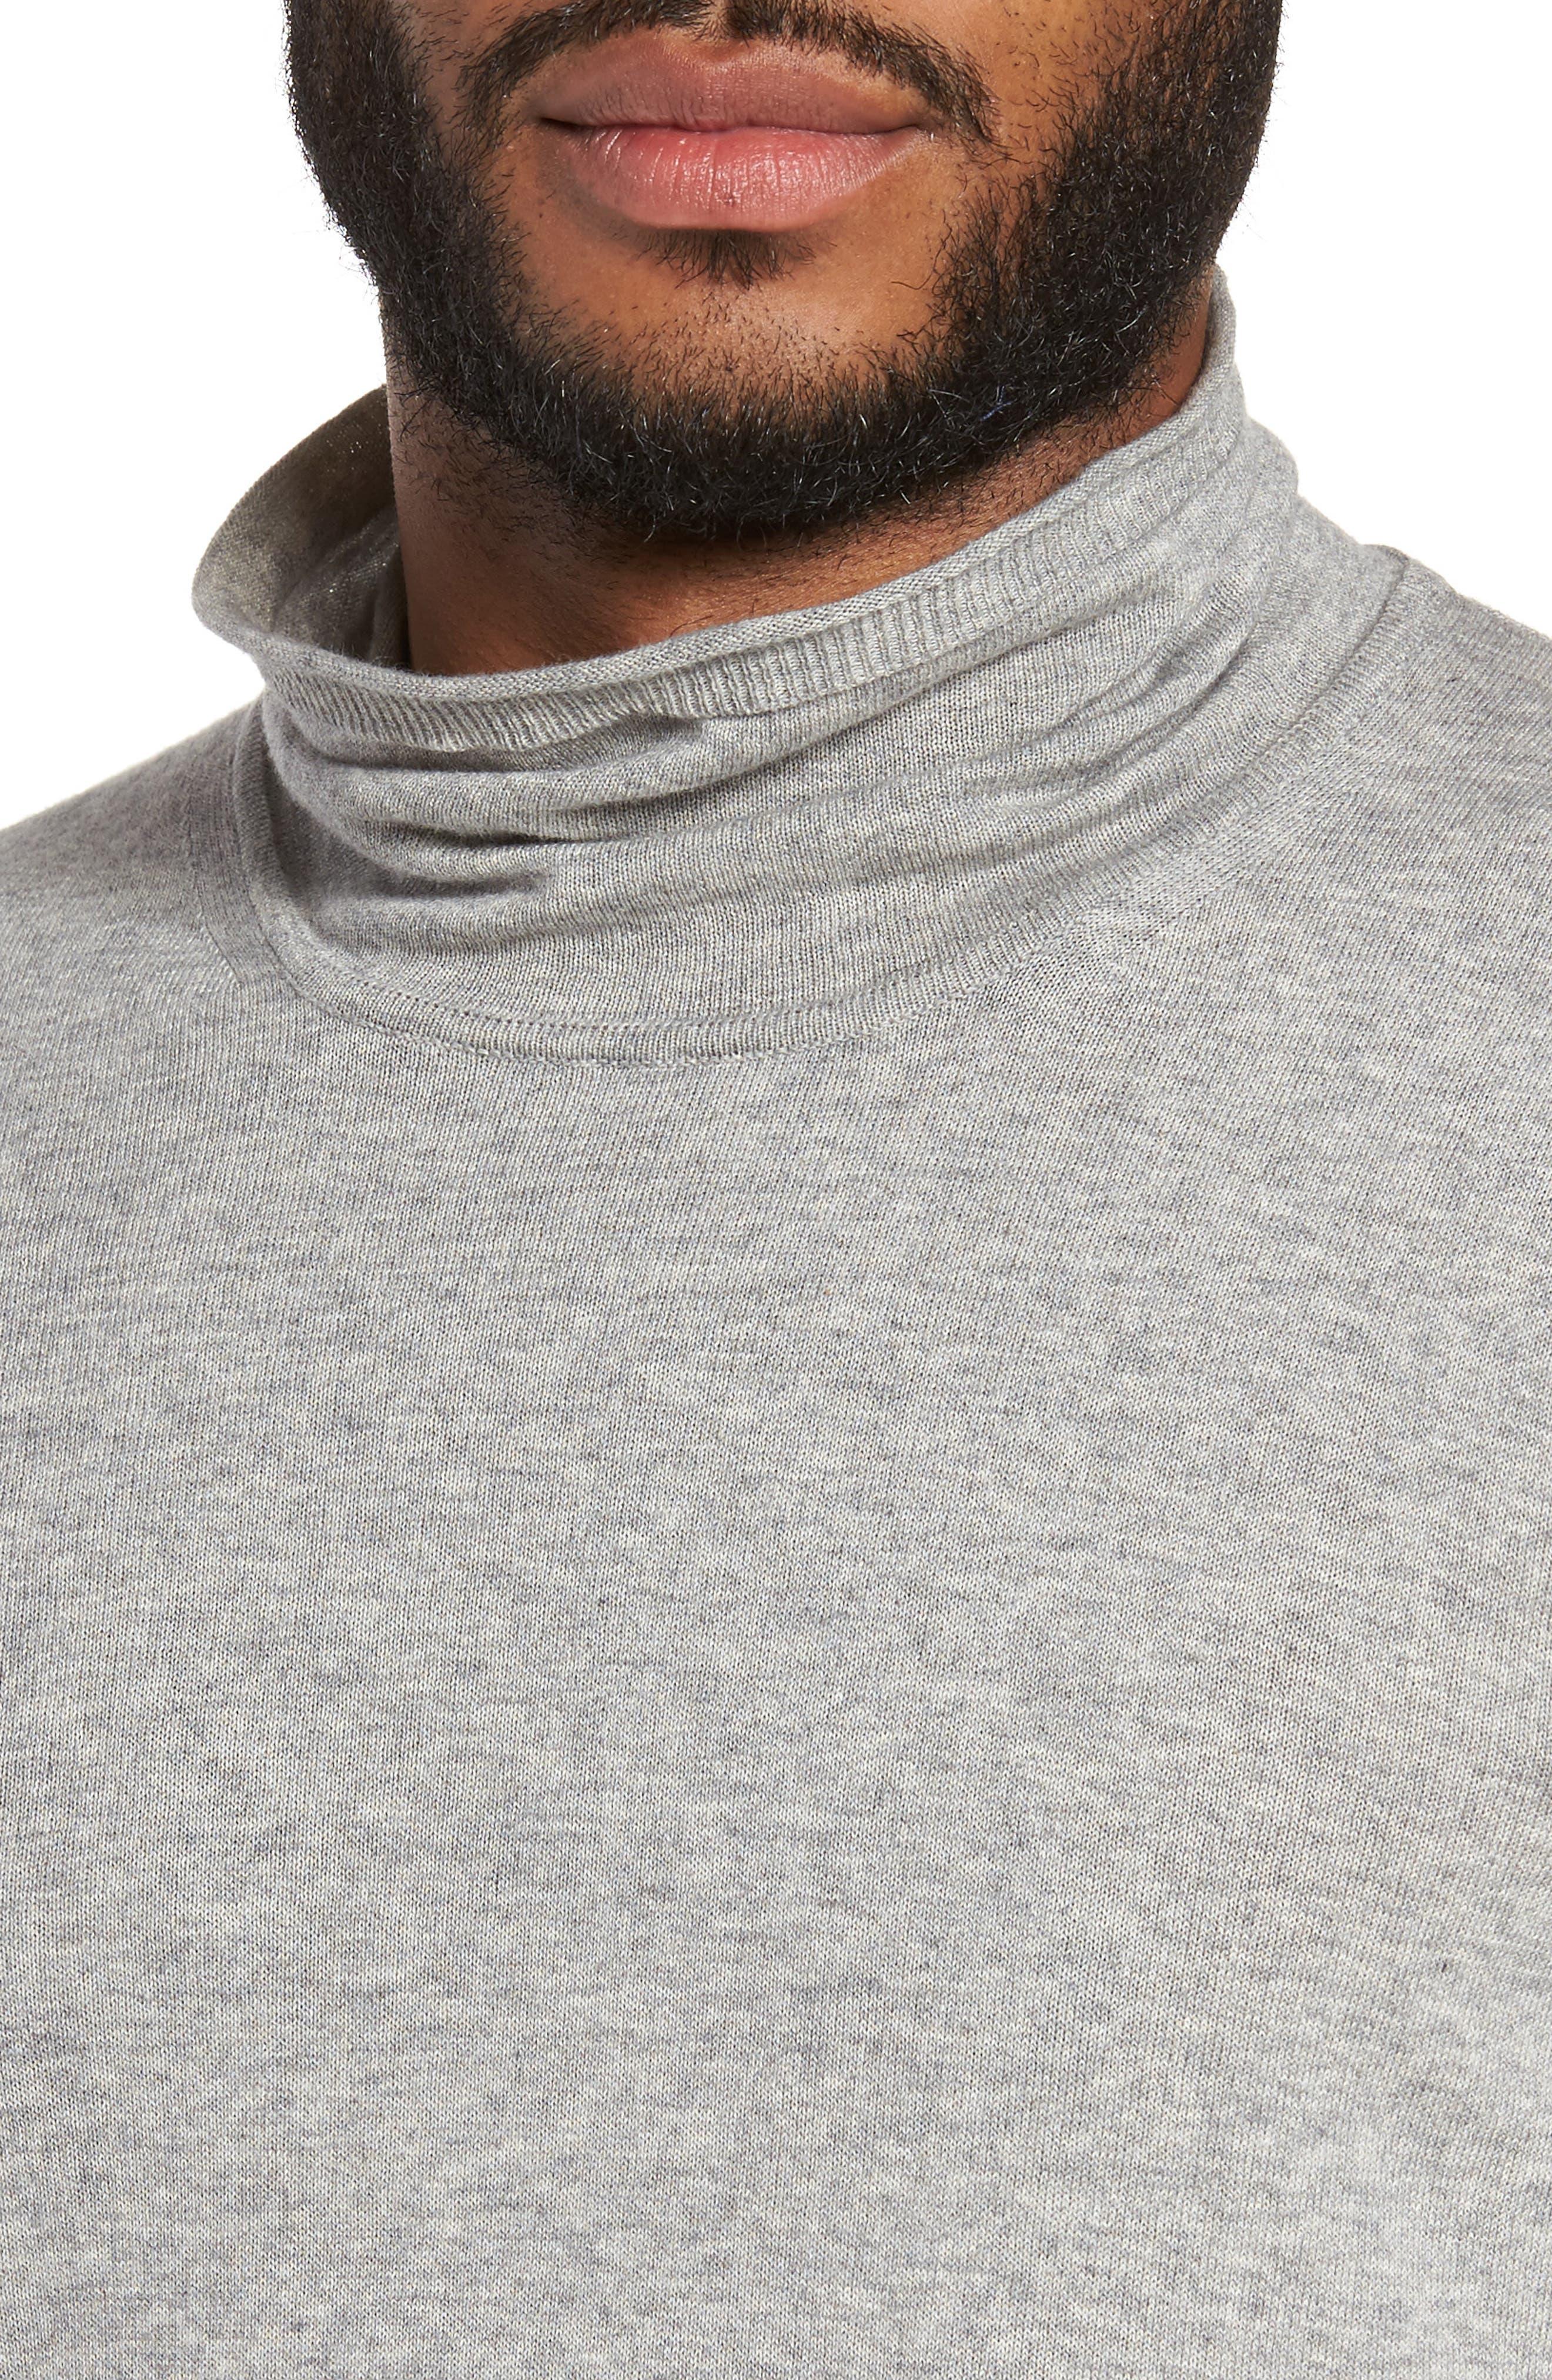 Hess Wool Turtleneck Sweater,                             Alternate thumbnail 7, color,